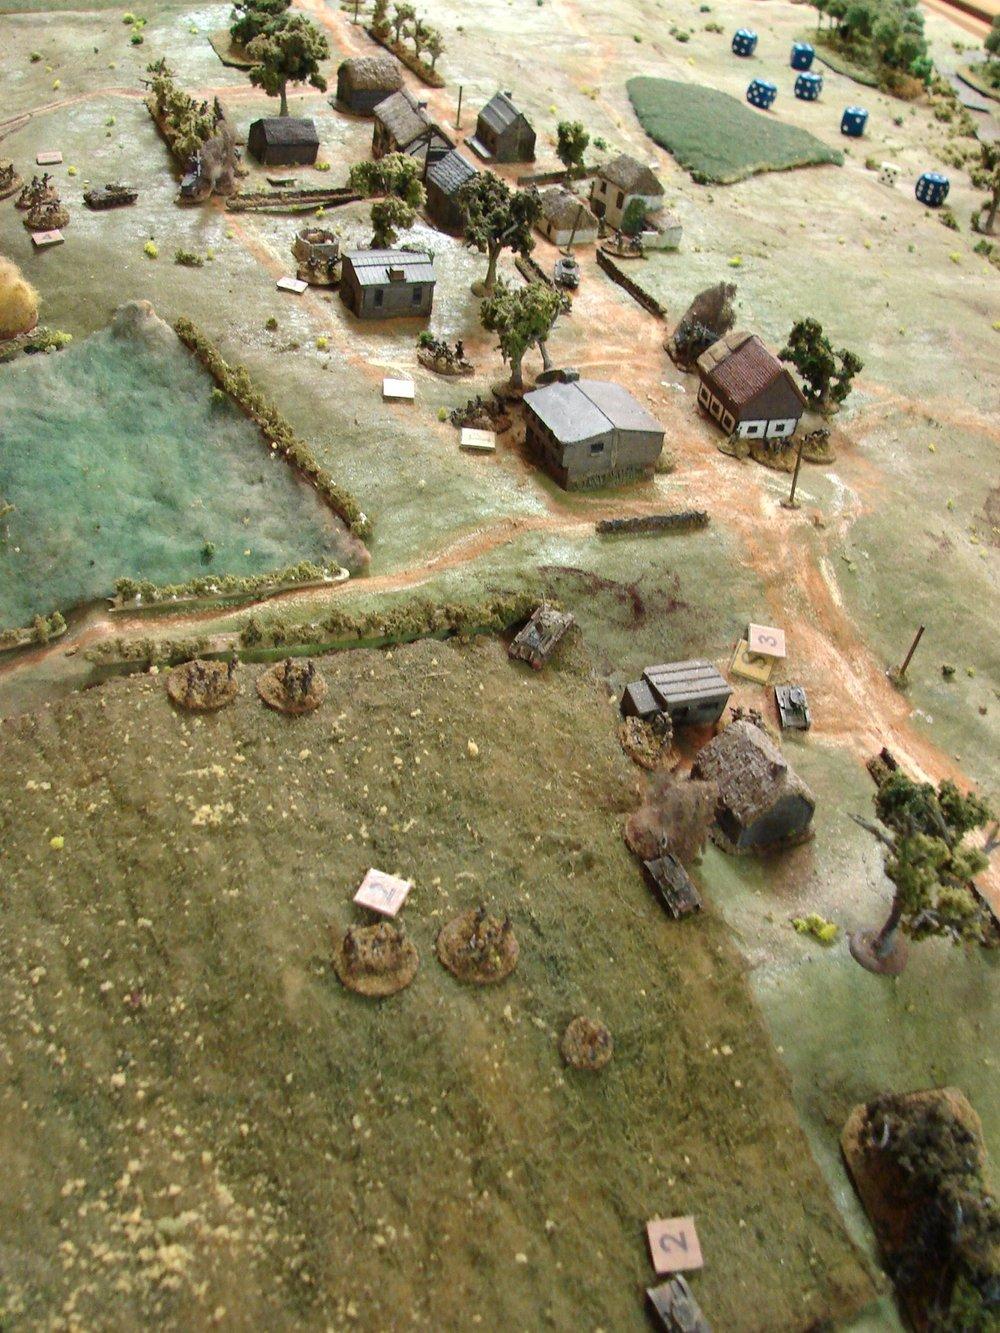 Un-coordinated advance along the ridge